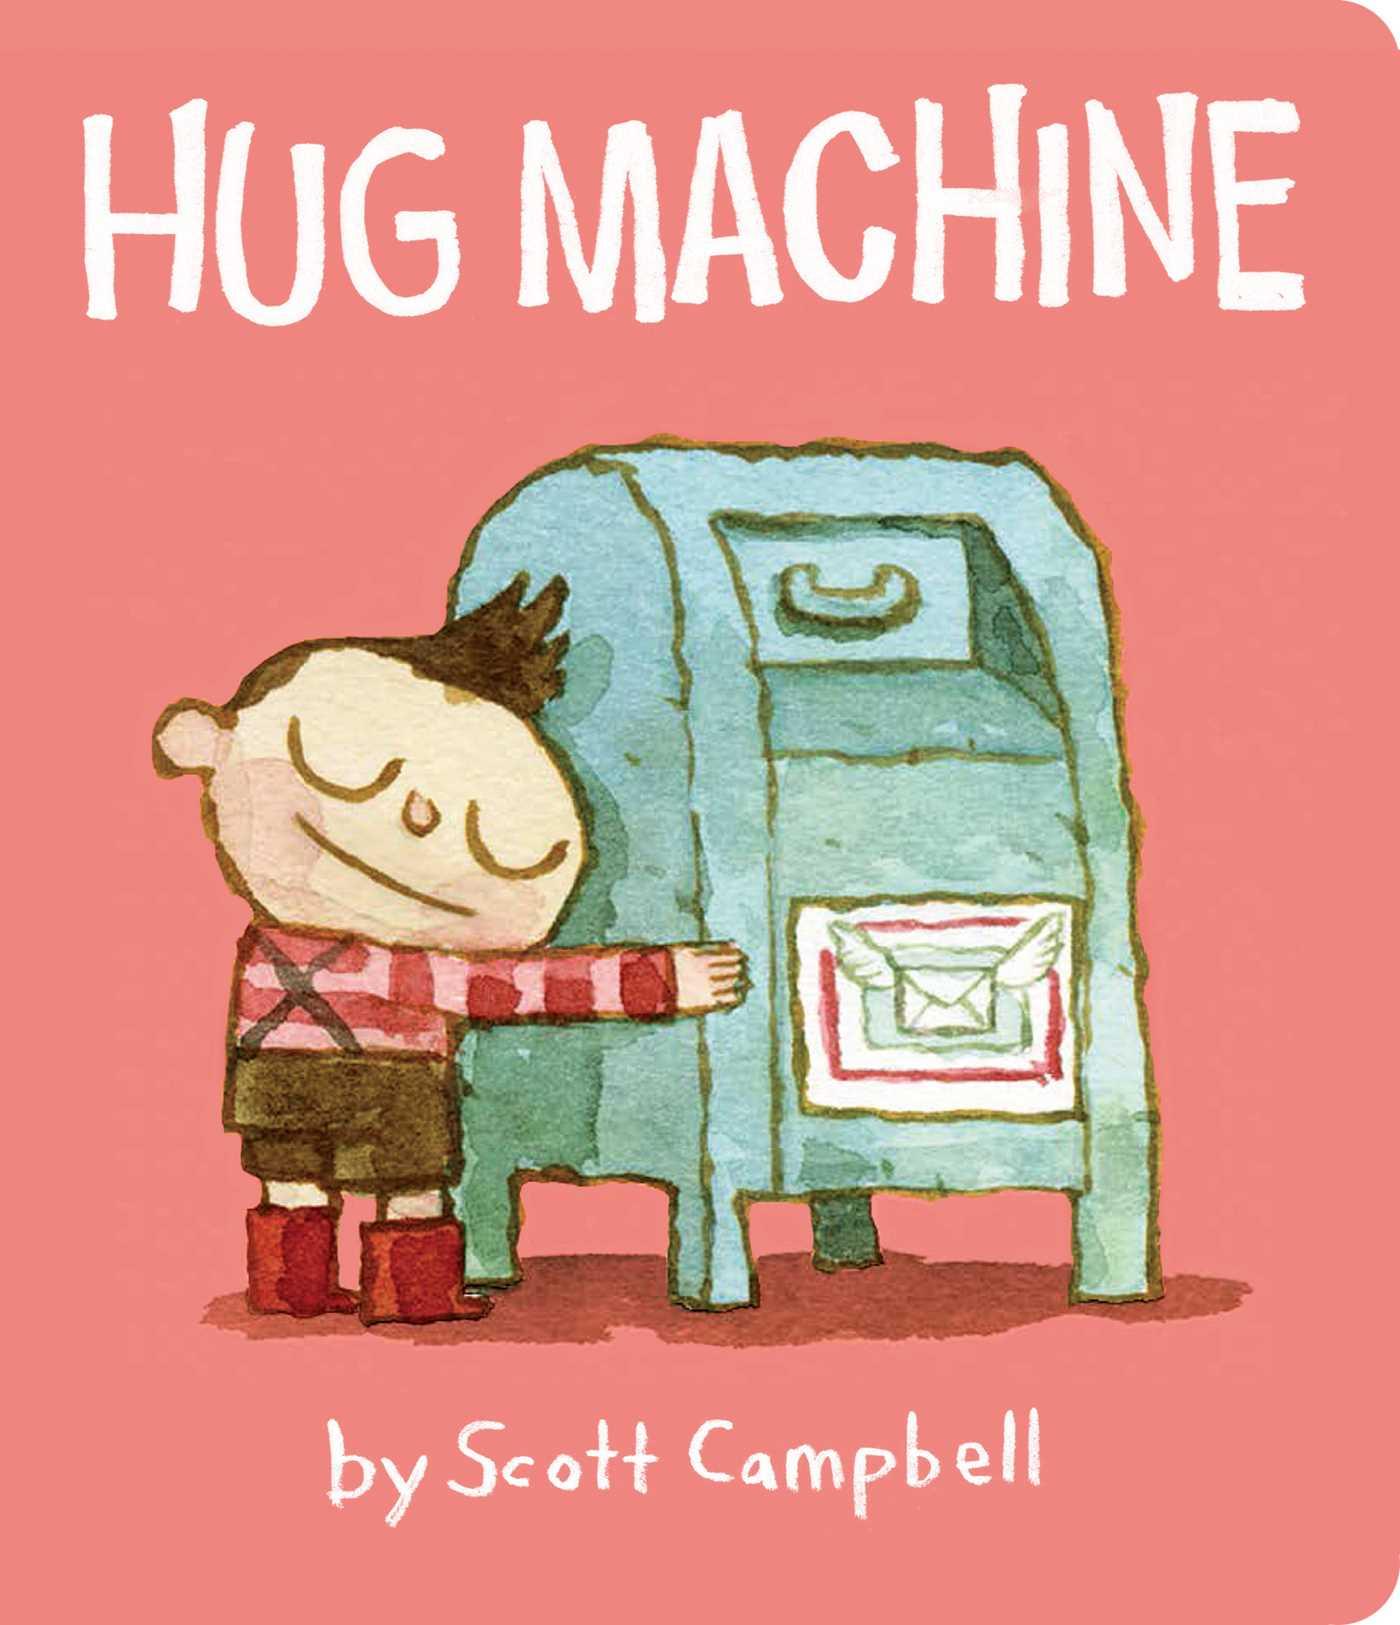 Hug machine 9781534400269 hr